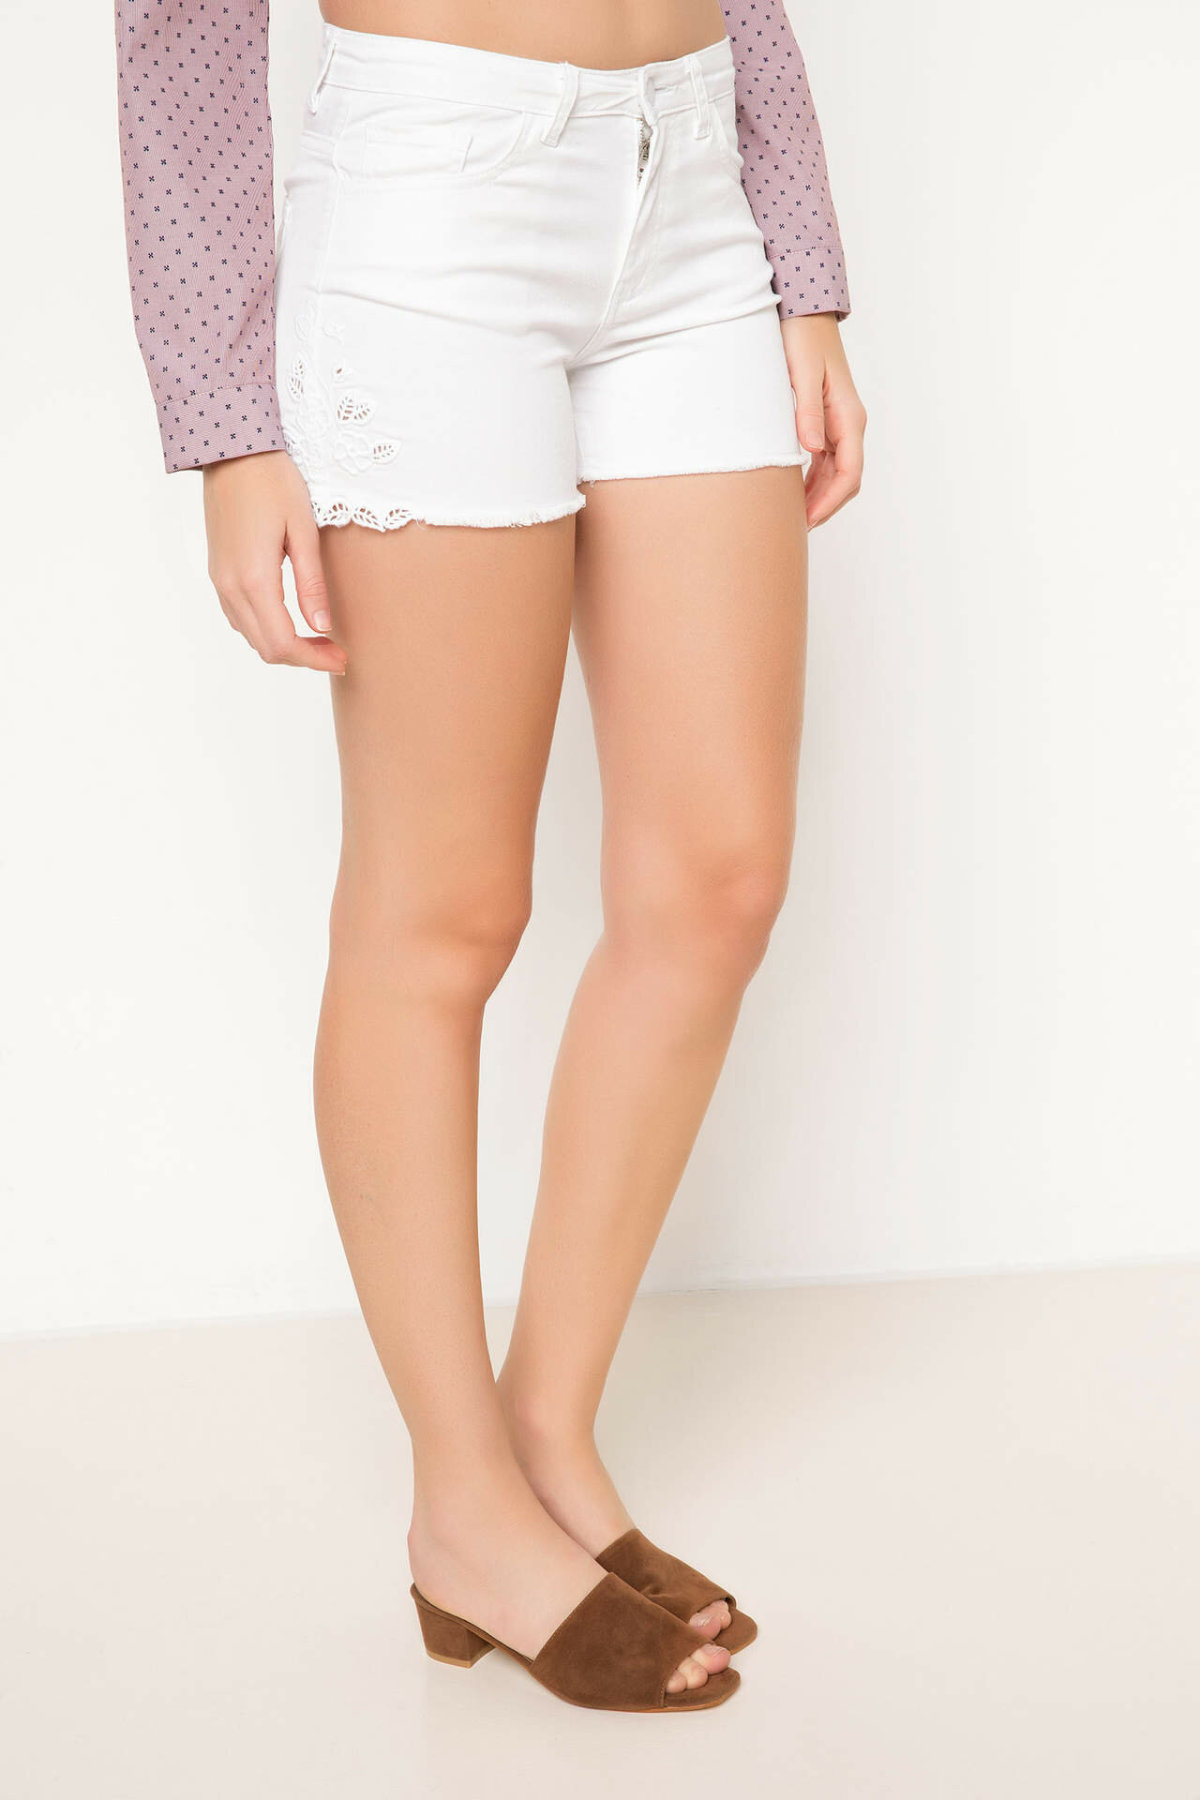 DeFacto Women Fashion Short Pants Female Casual Slim High Quality Shorts Summer Simple Joker White - H8891AZ17HS